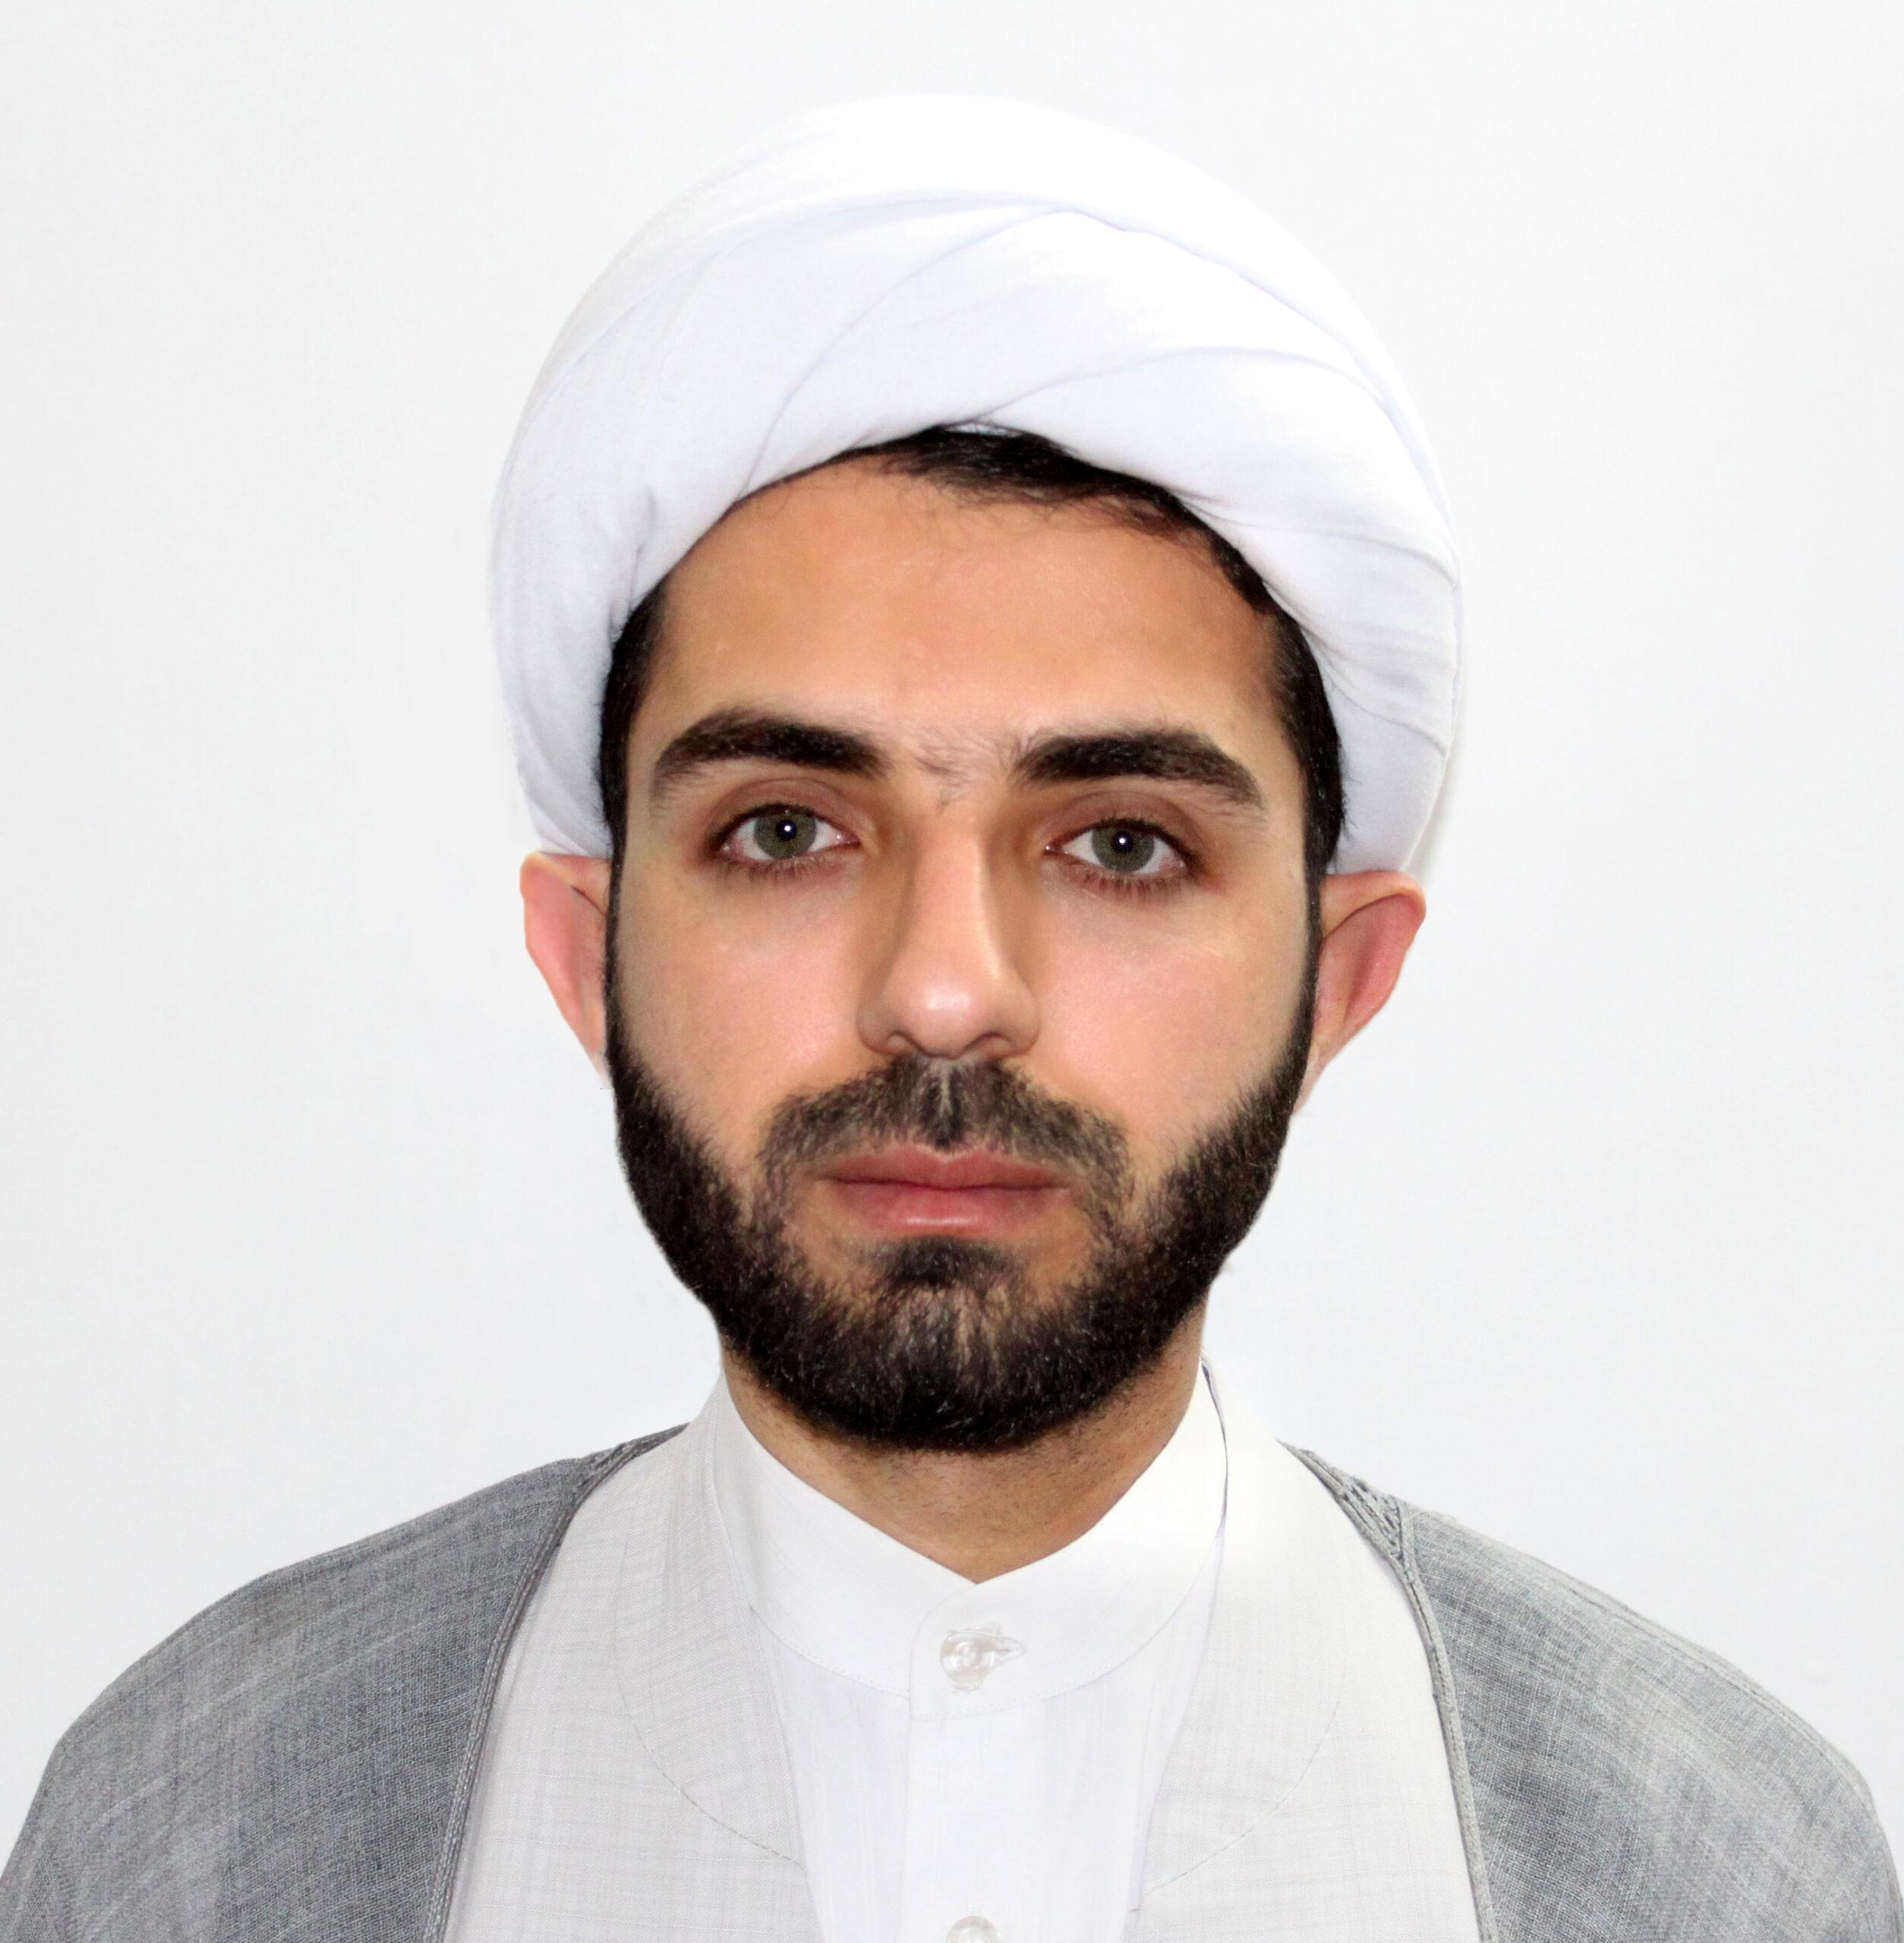 زندگینامه حجت الاسلام و المسلمین محمدمهدی مقدسی